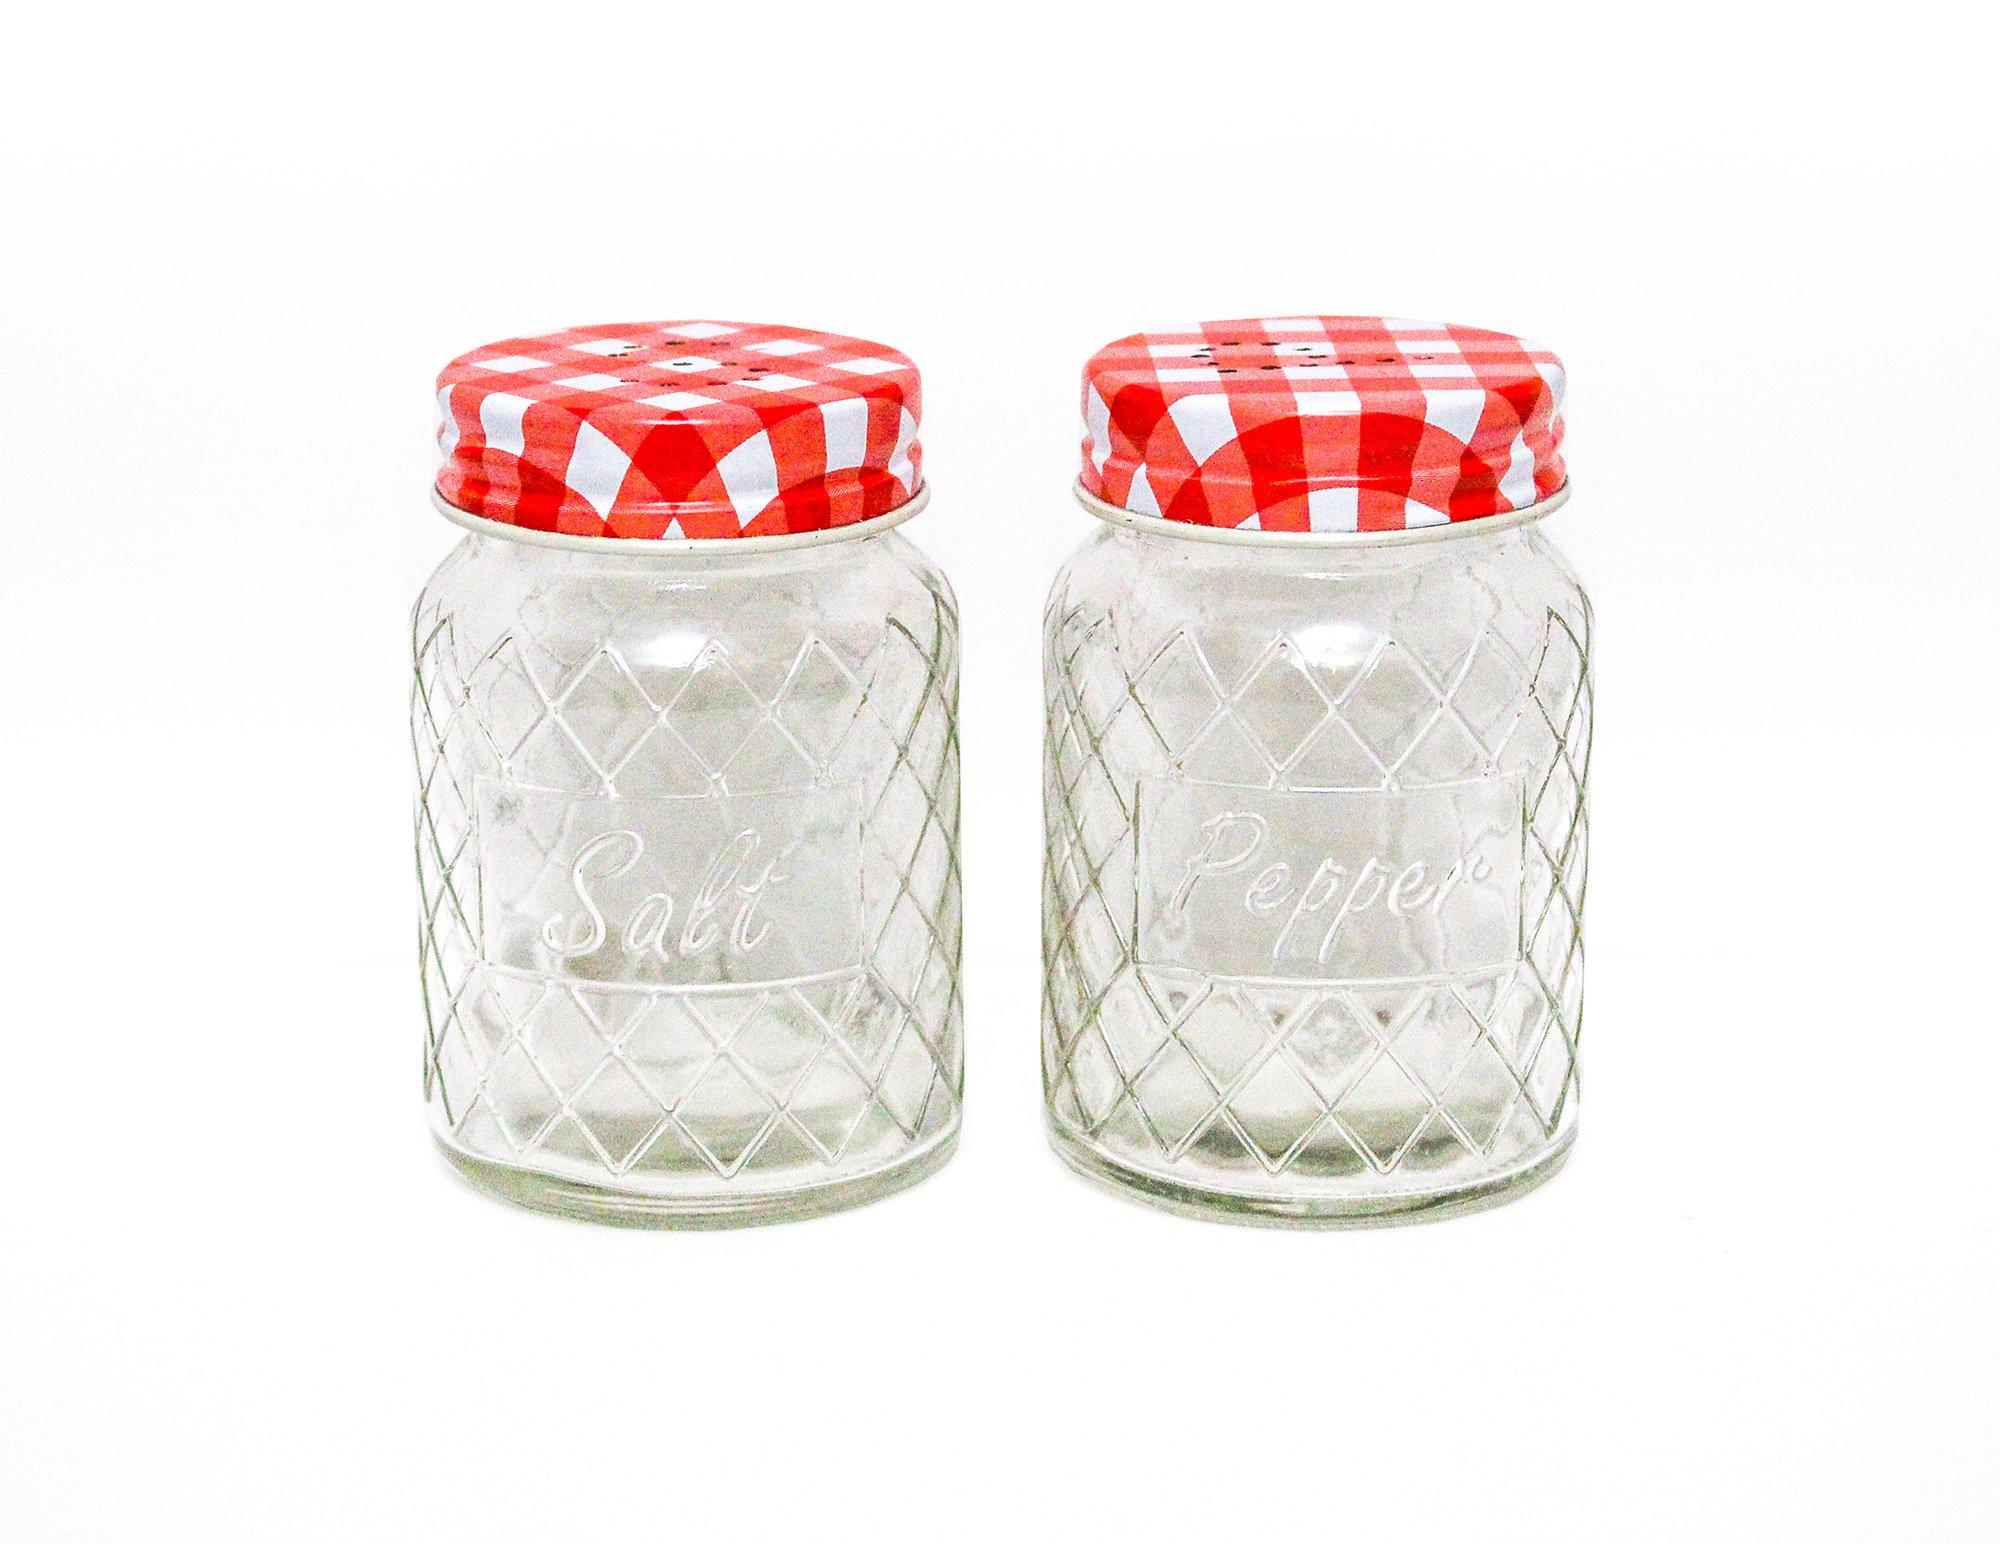 Home Essentials & Beyond Decorative Diamond Design Glass Set of 2 Salt & Pepper Shaker Spice Bottles Barbecue Condiment Bottles Kitchen Supplies